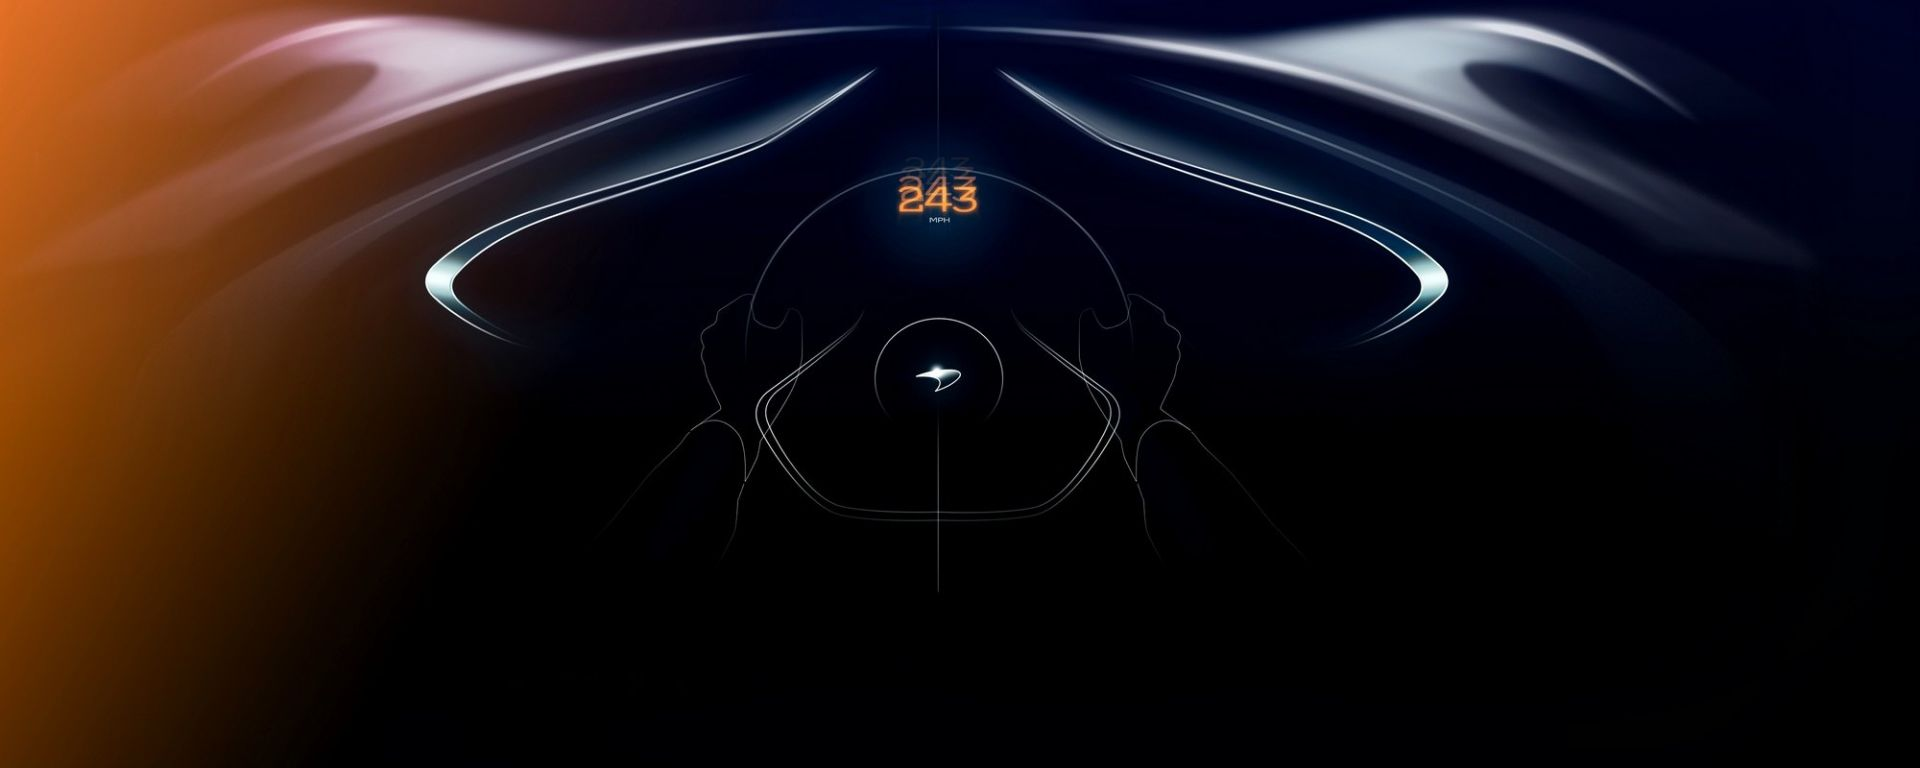 McLaren BP23 Hyper GT: oltre i 391 km/h